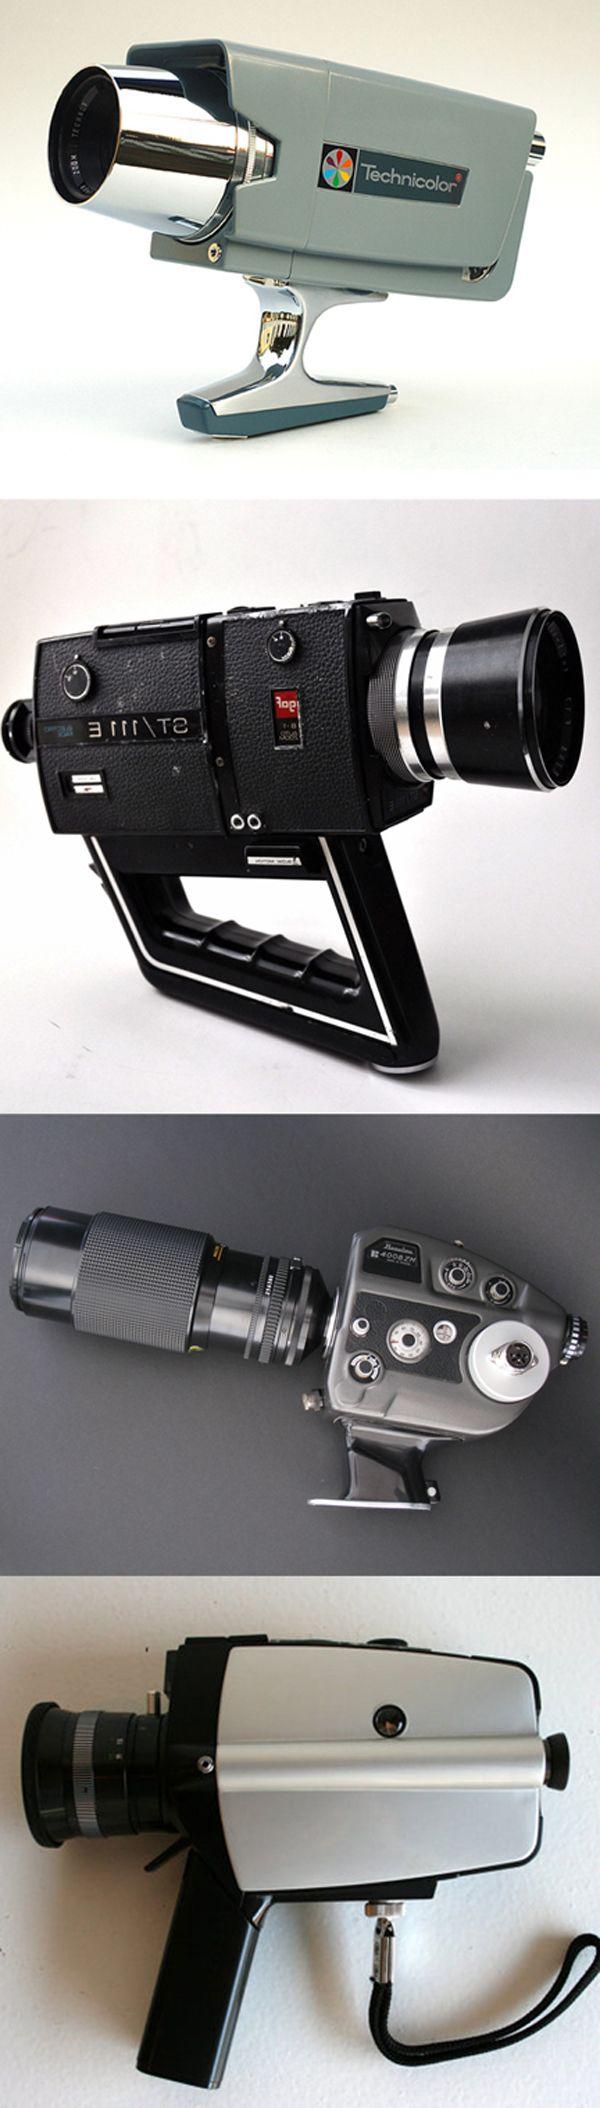 Super 8 Camera ( 1960's / 1970's Technicolor / Chinon Gaf / Beaulieu ( vintage retro camera movie camera / cinema / film camera / super8 mm / motion picture camera )